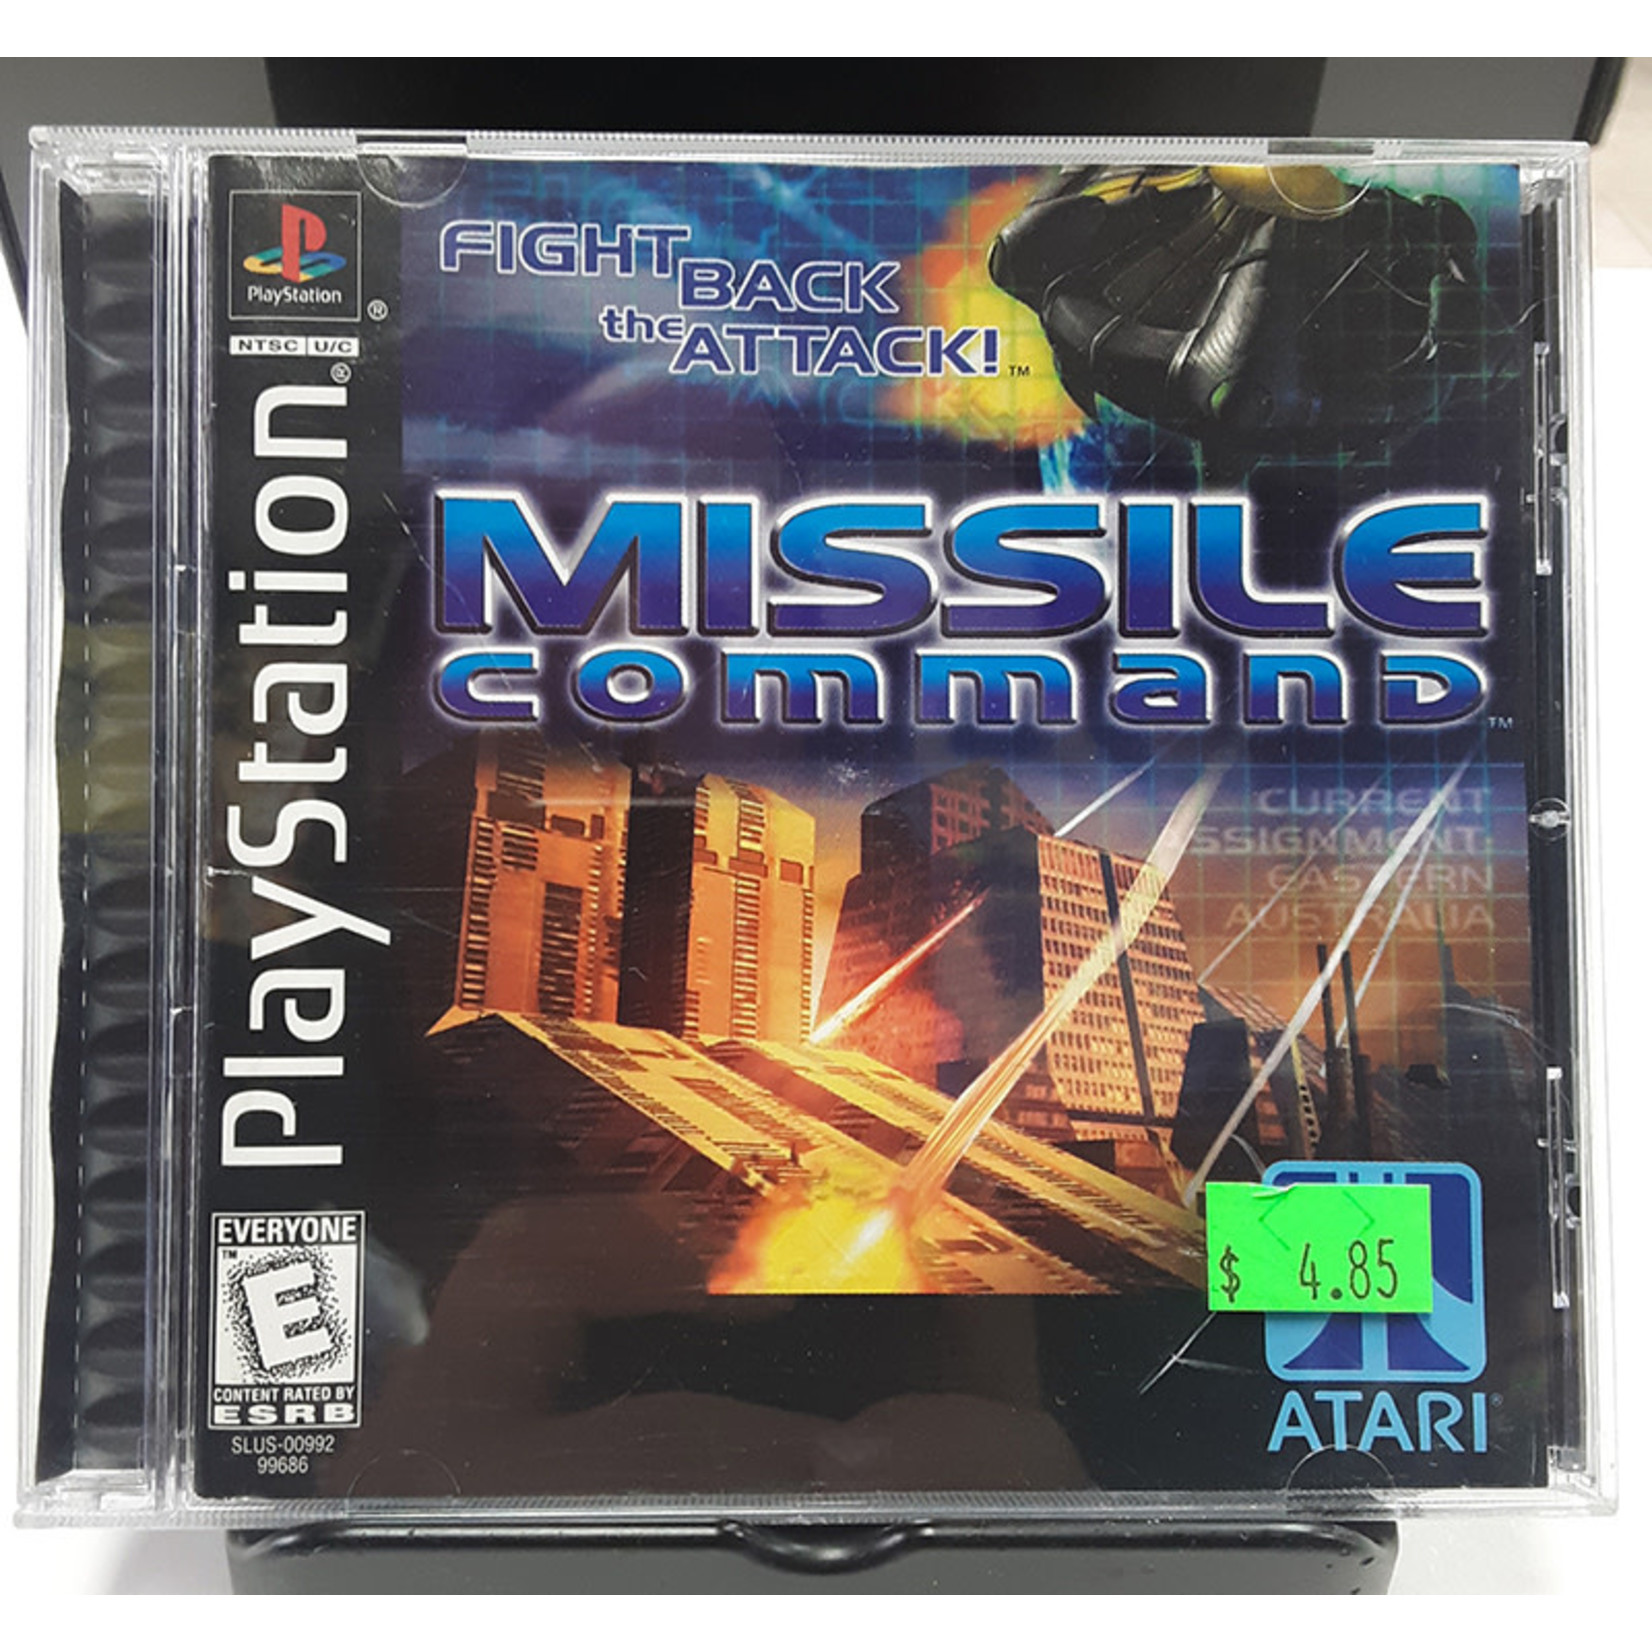 ps1u-missile command